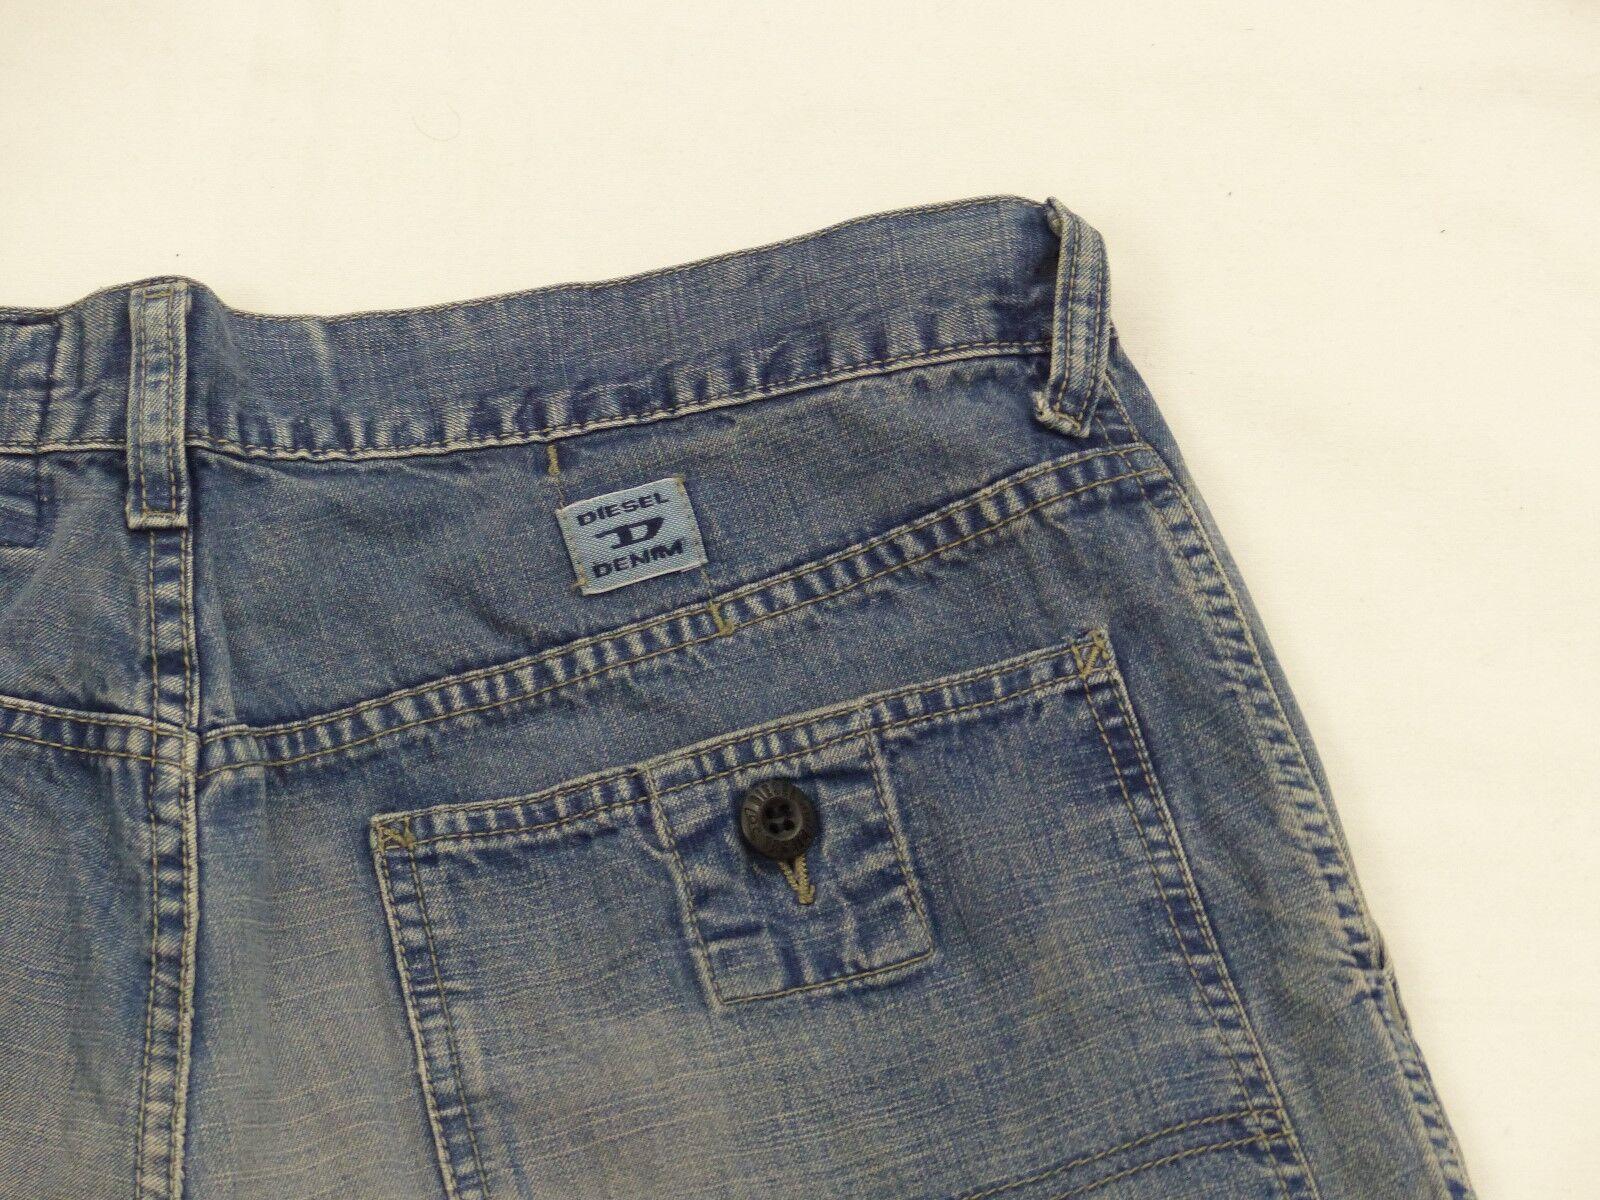 Diesel Demin Casual Jeans Pantaloni  MASTER MASTER MASTER  retro  Blu  VINTAGE  saddle  Gr  33tip Top f62df8